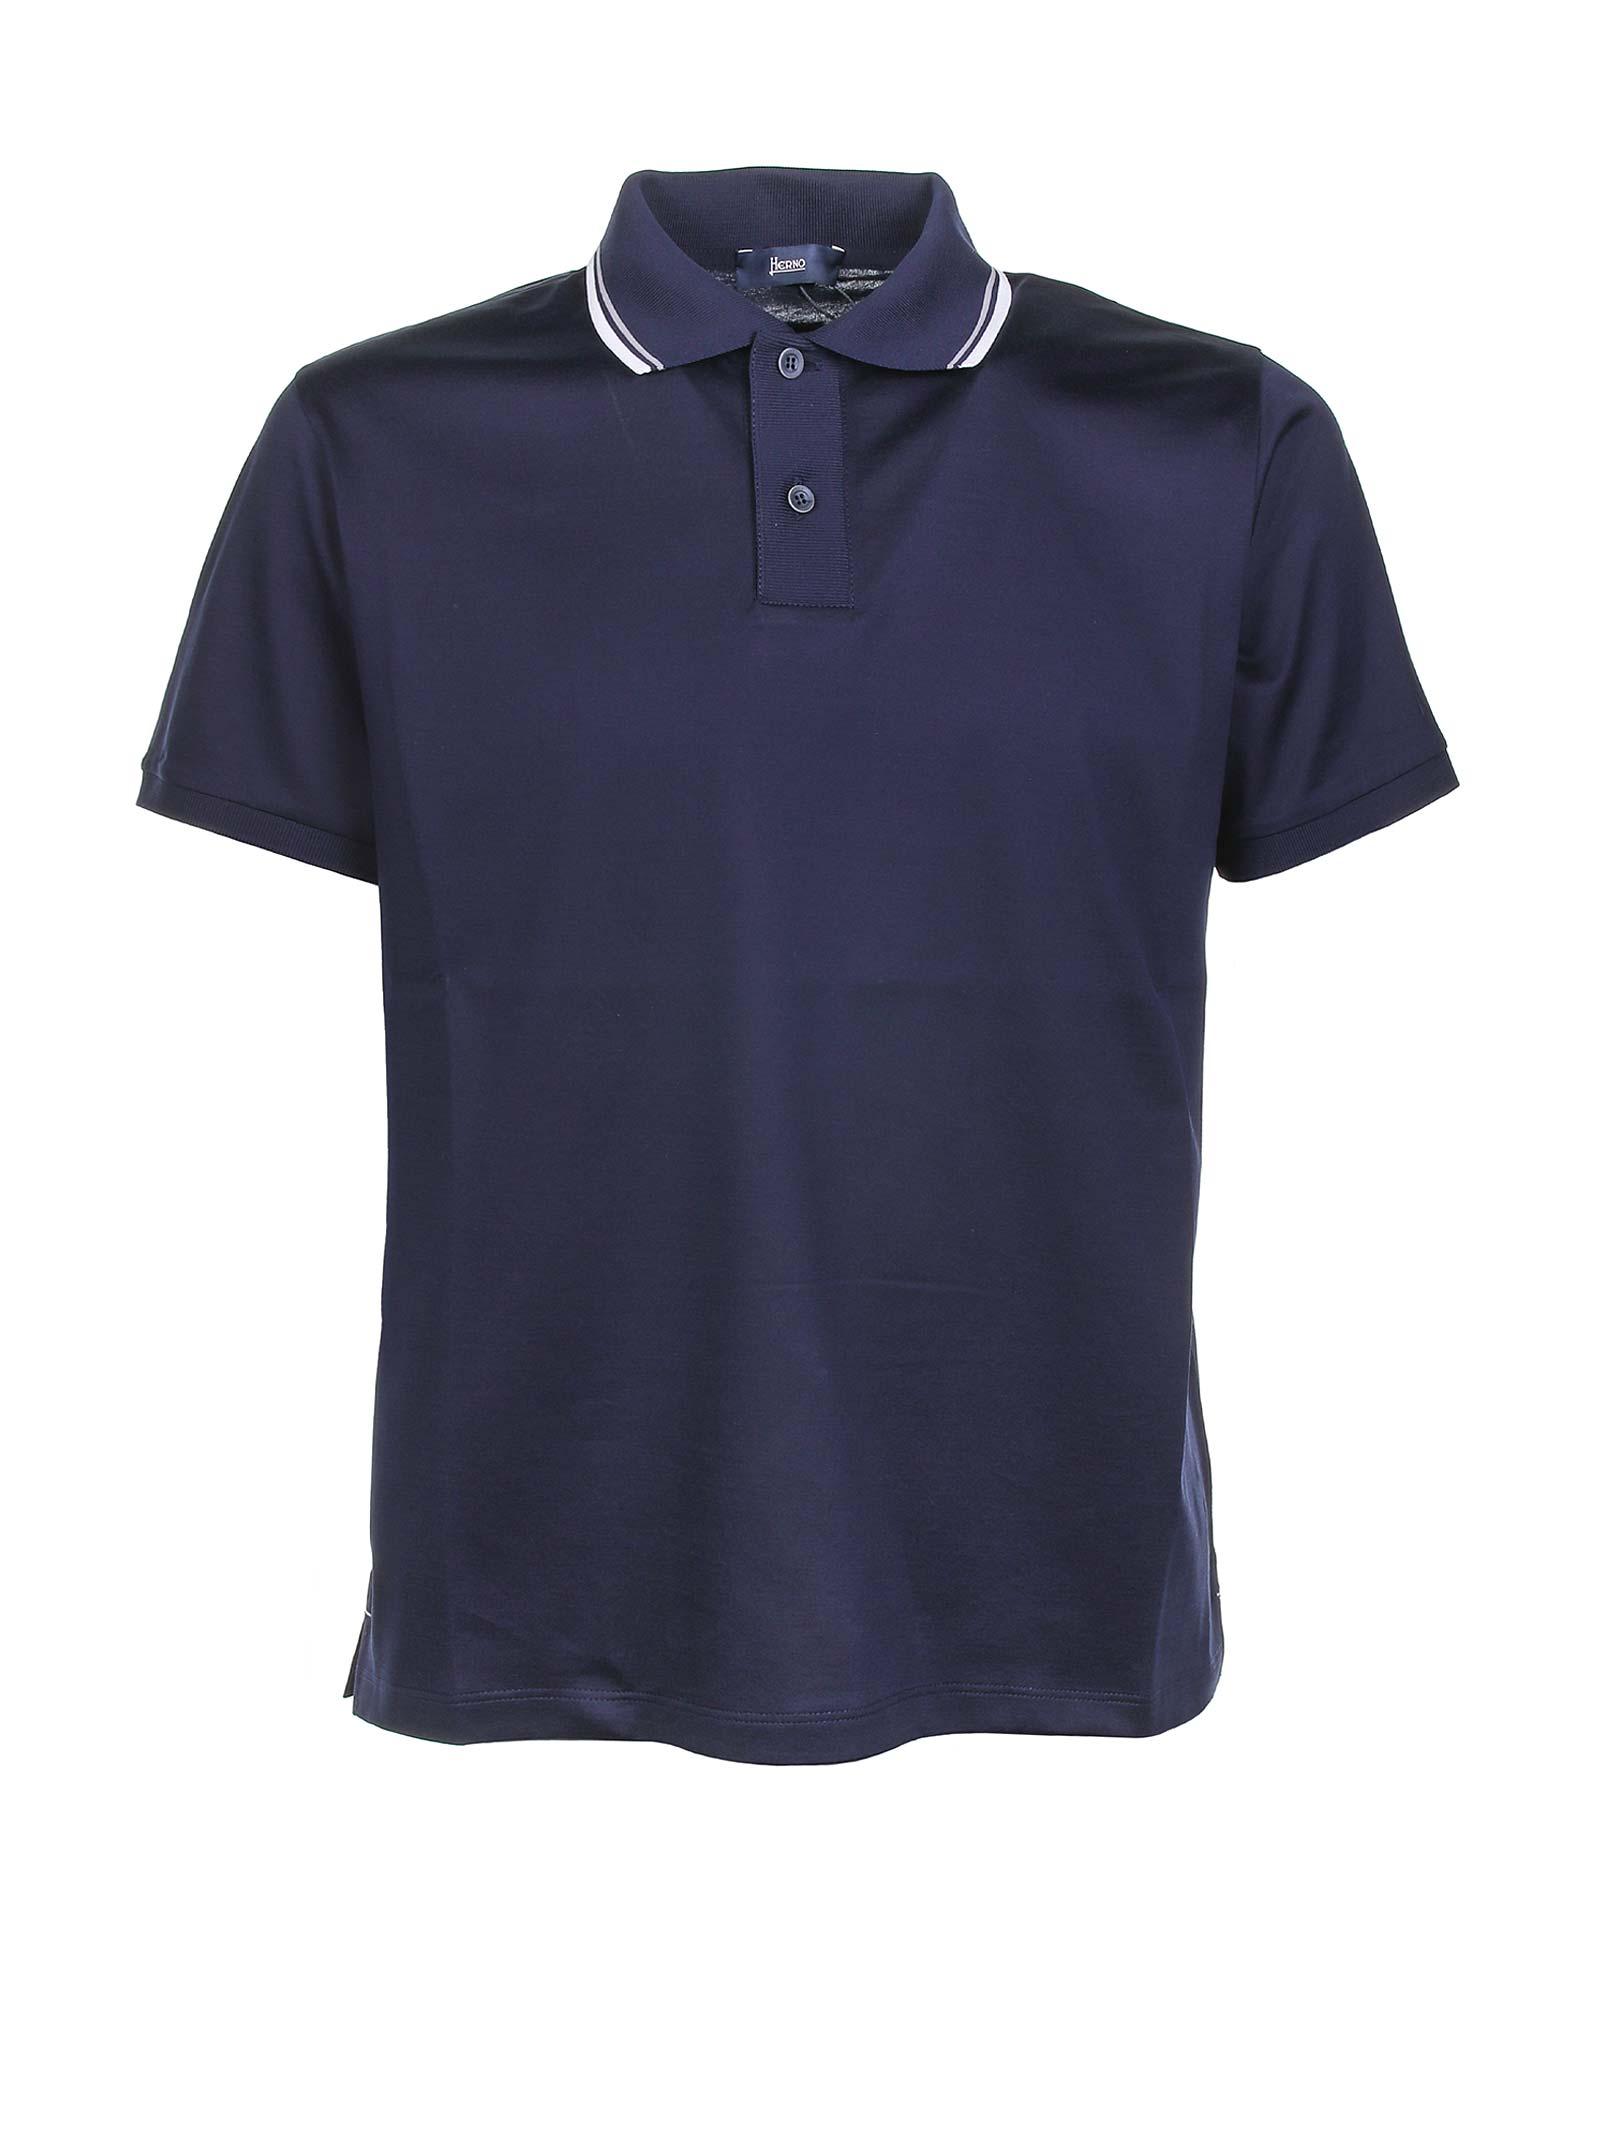 Stripe Trimmed Collar Polo Shirt